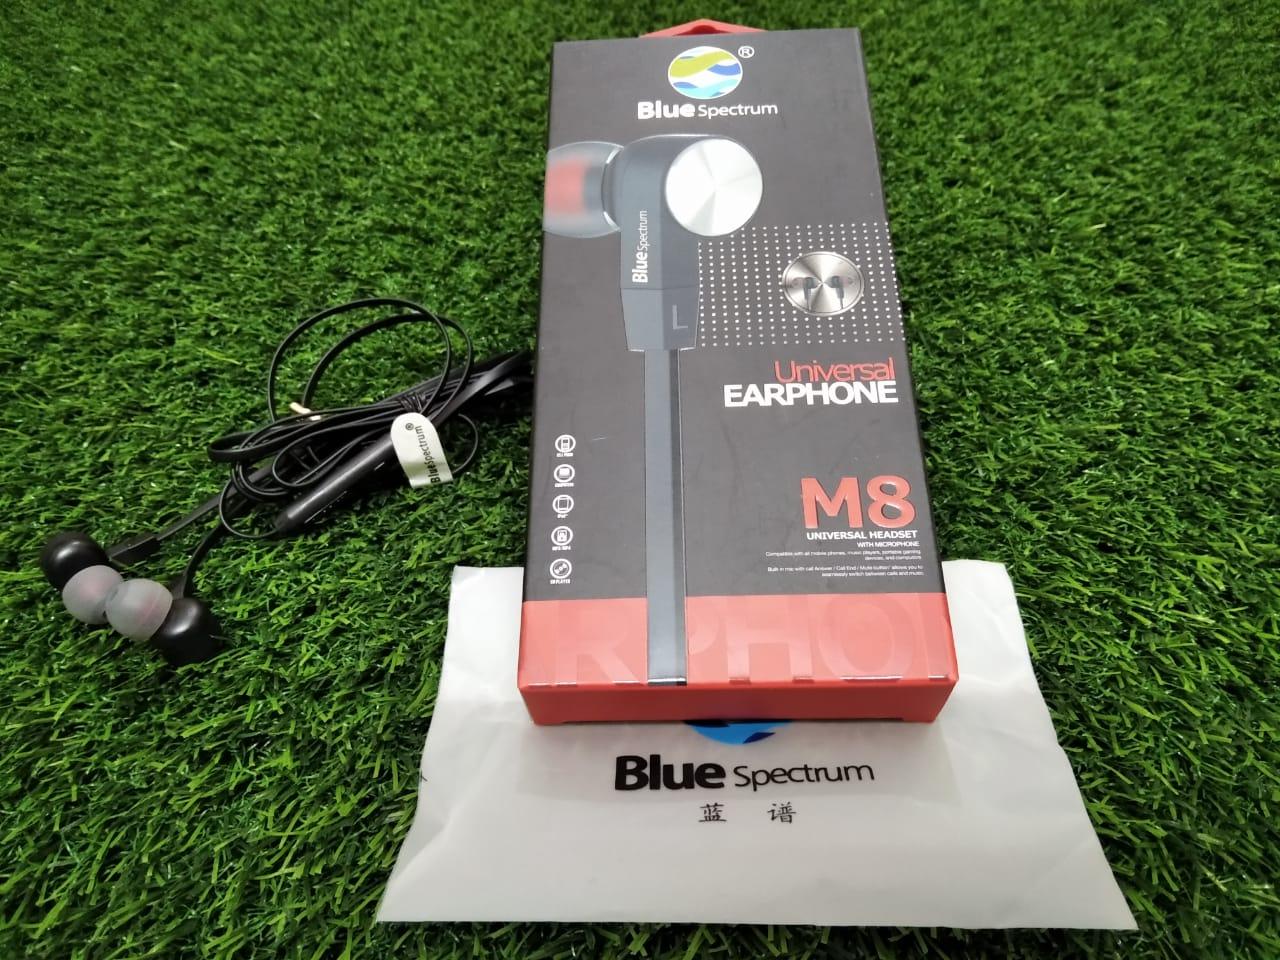 Blue Spectrum Stereo Hand Free M8